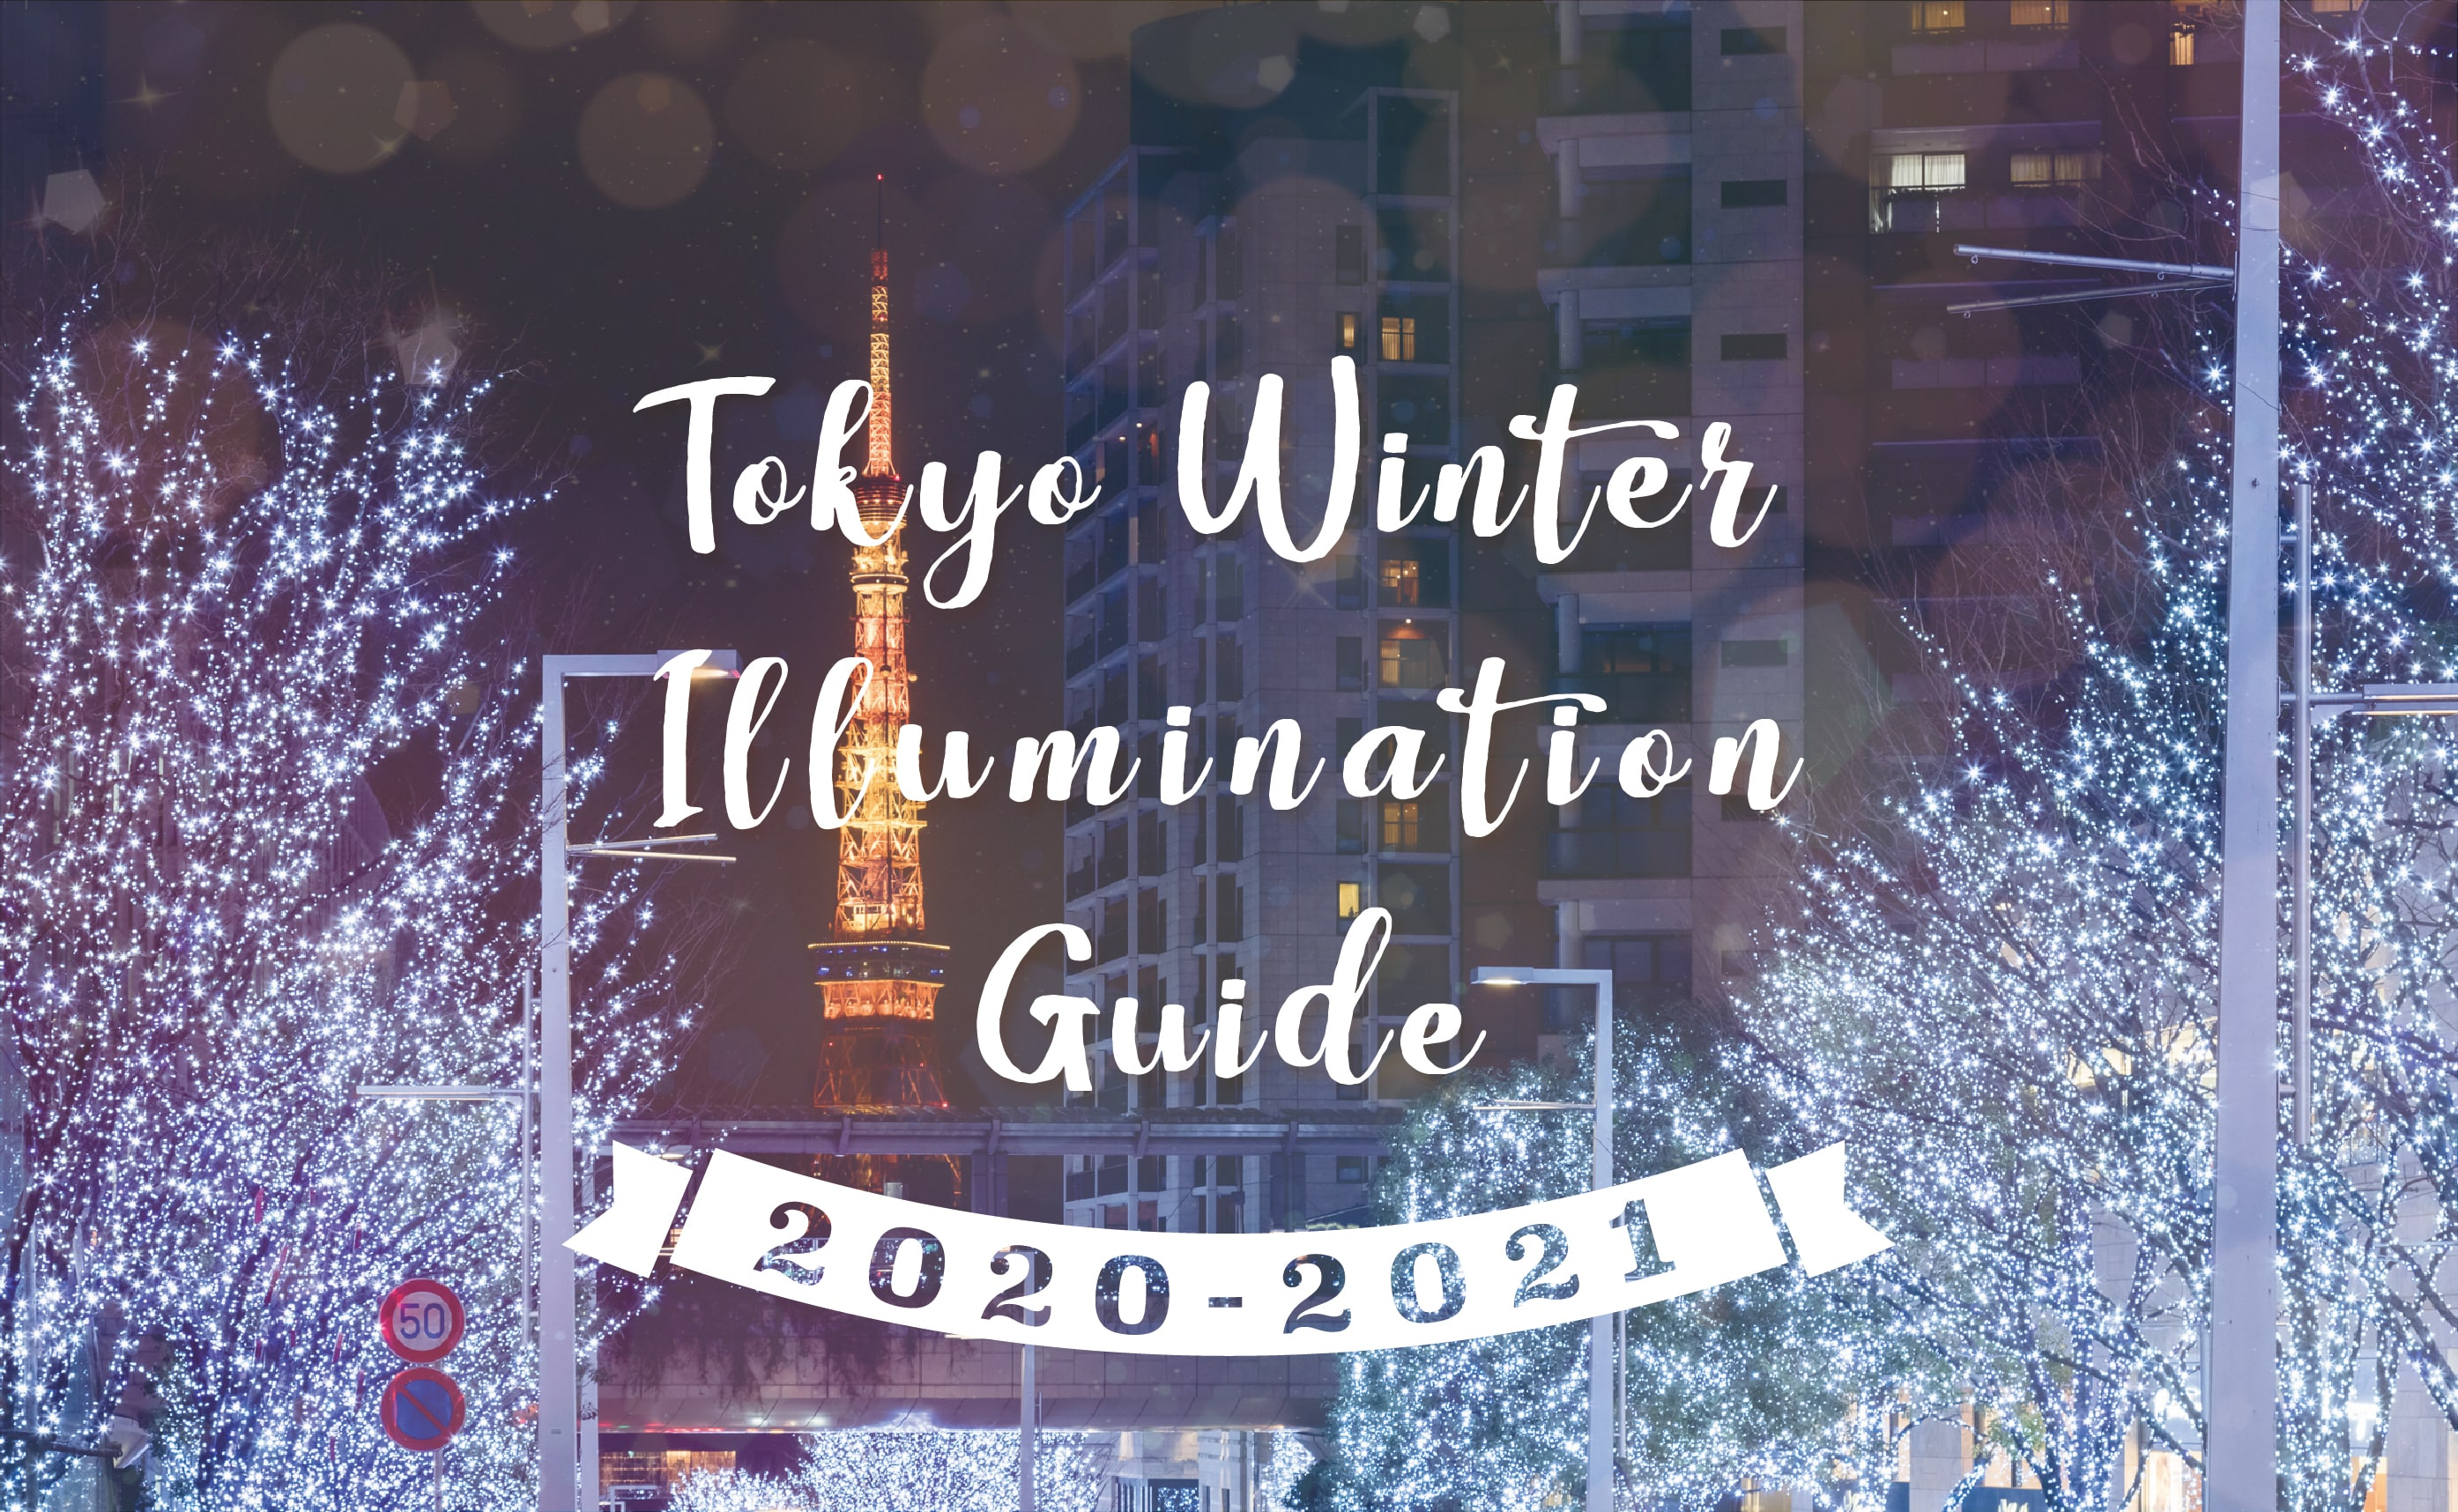 Tokyo Winter Illumination Guide 2020-2021